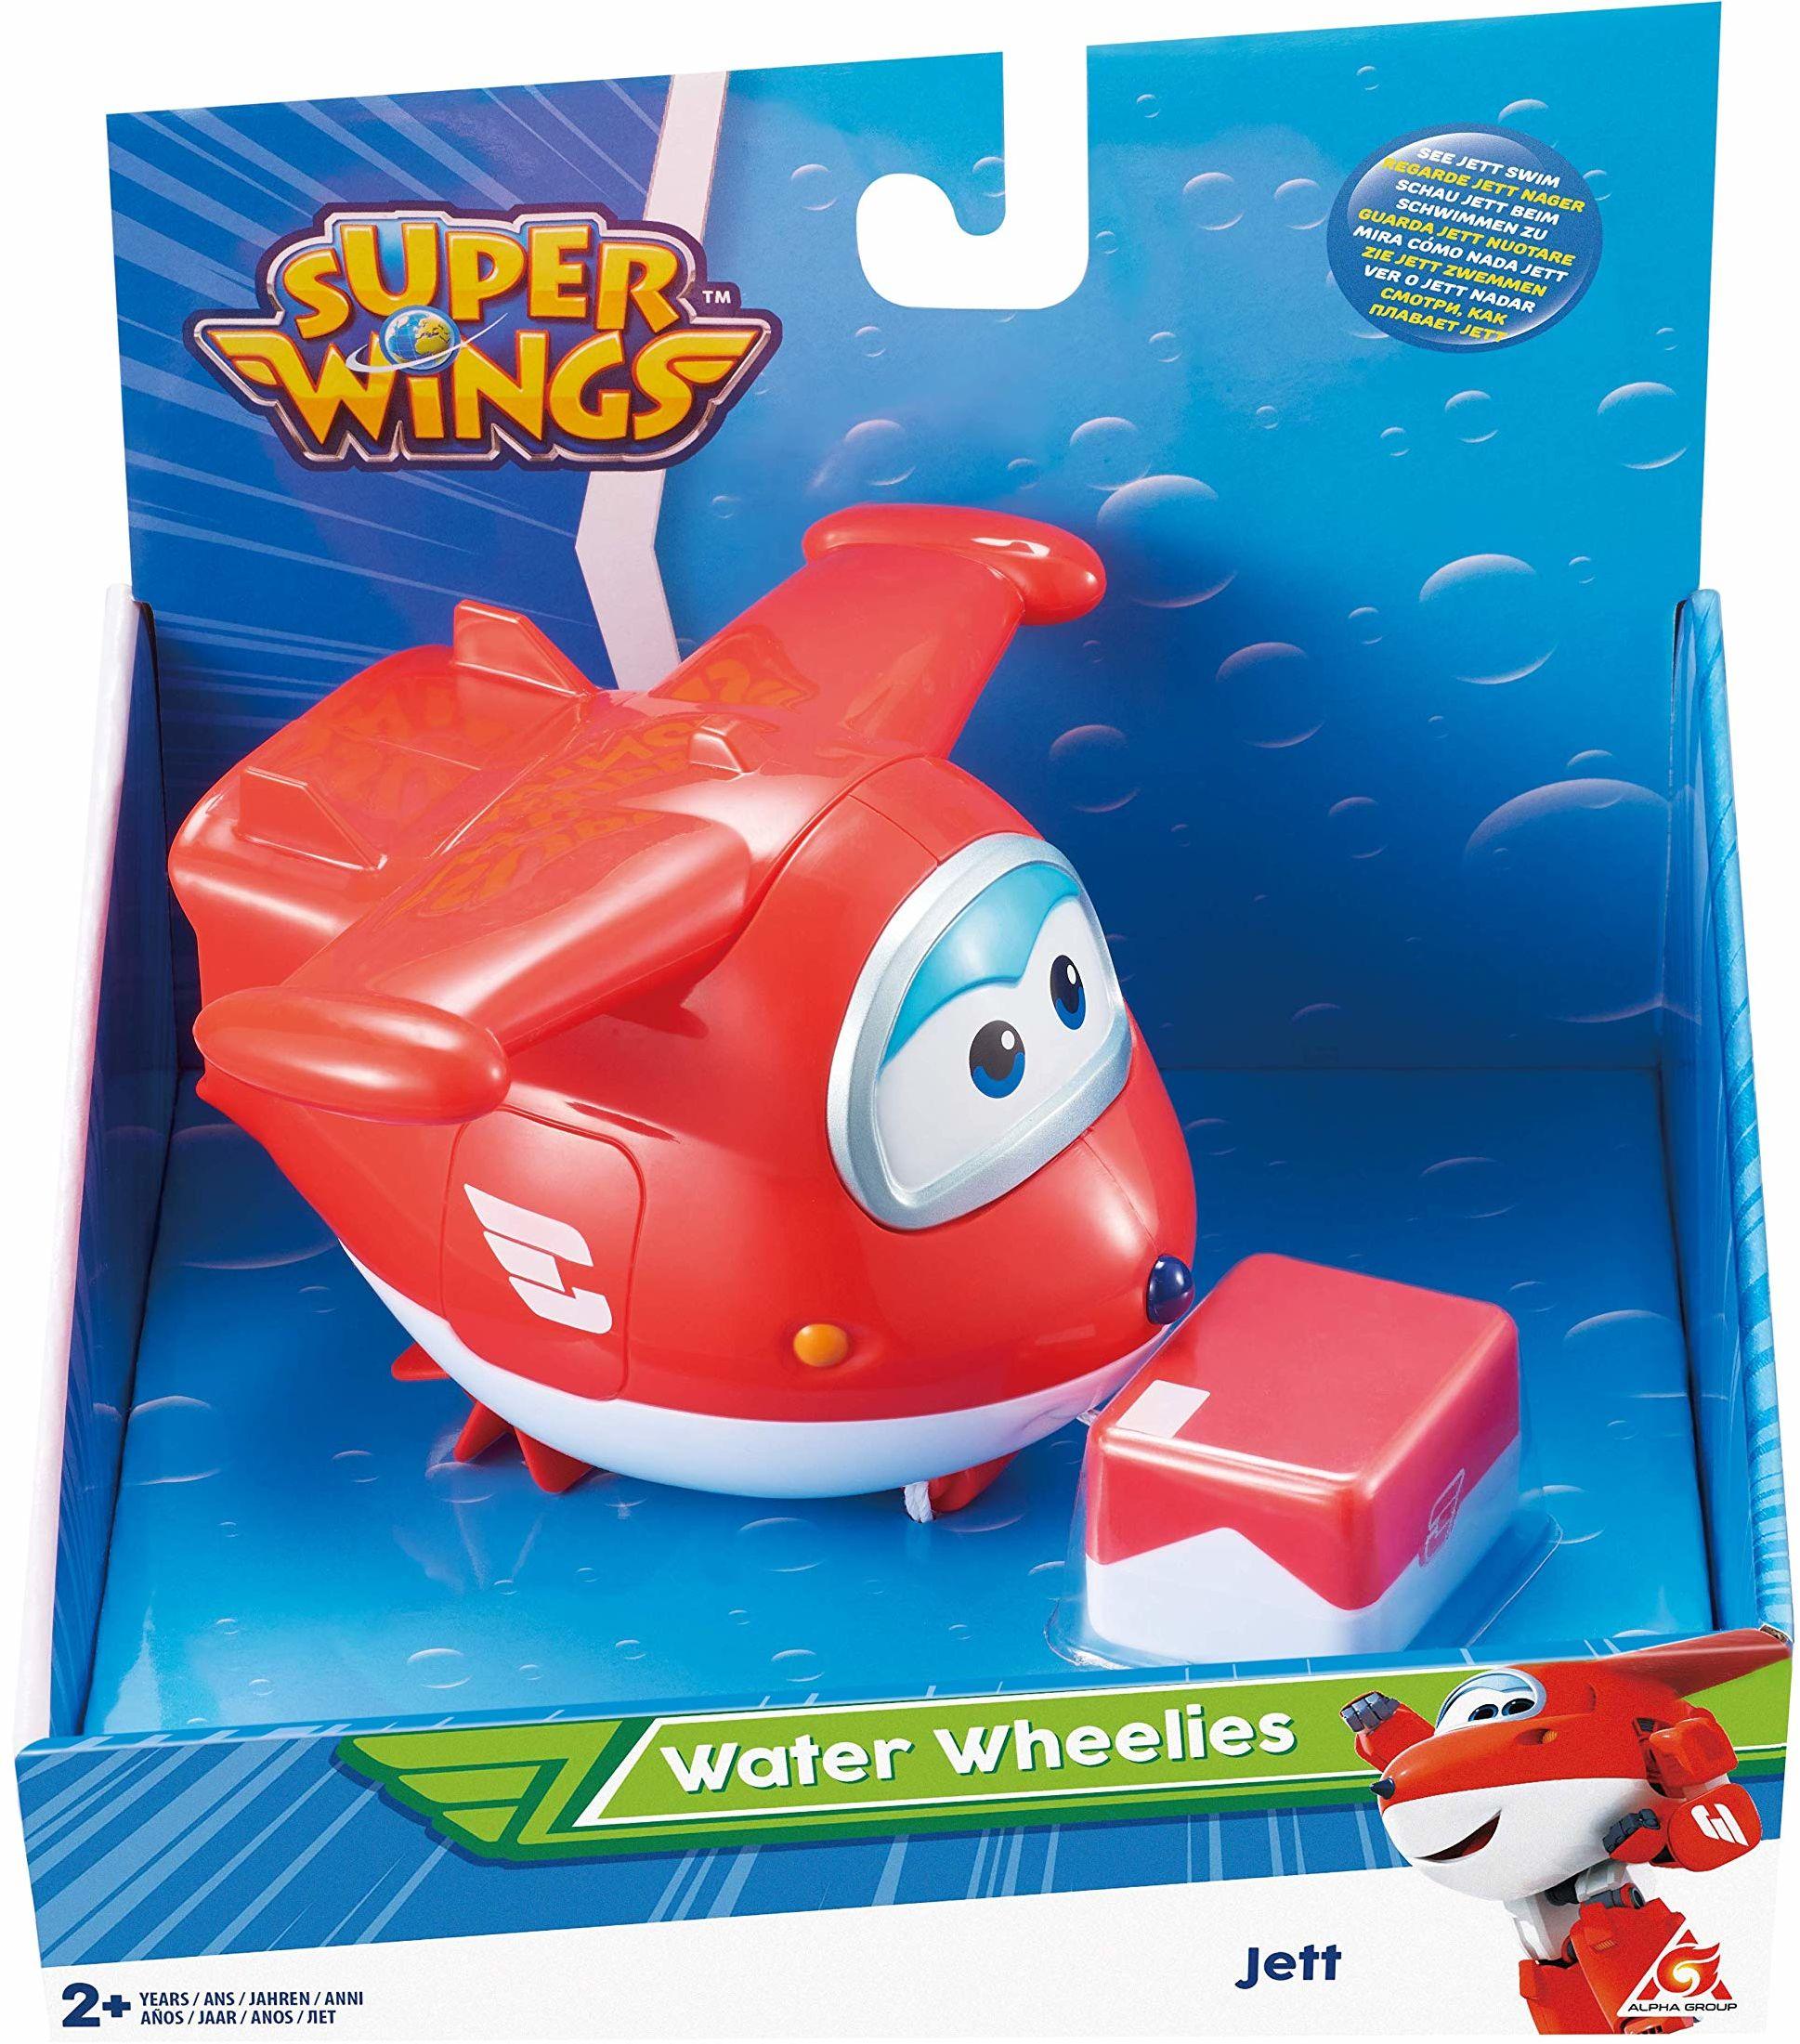 Super Wings EU721111 EU72111-Water Wheelies Jett